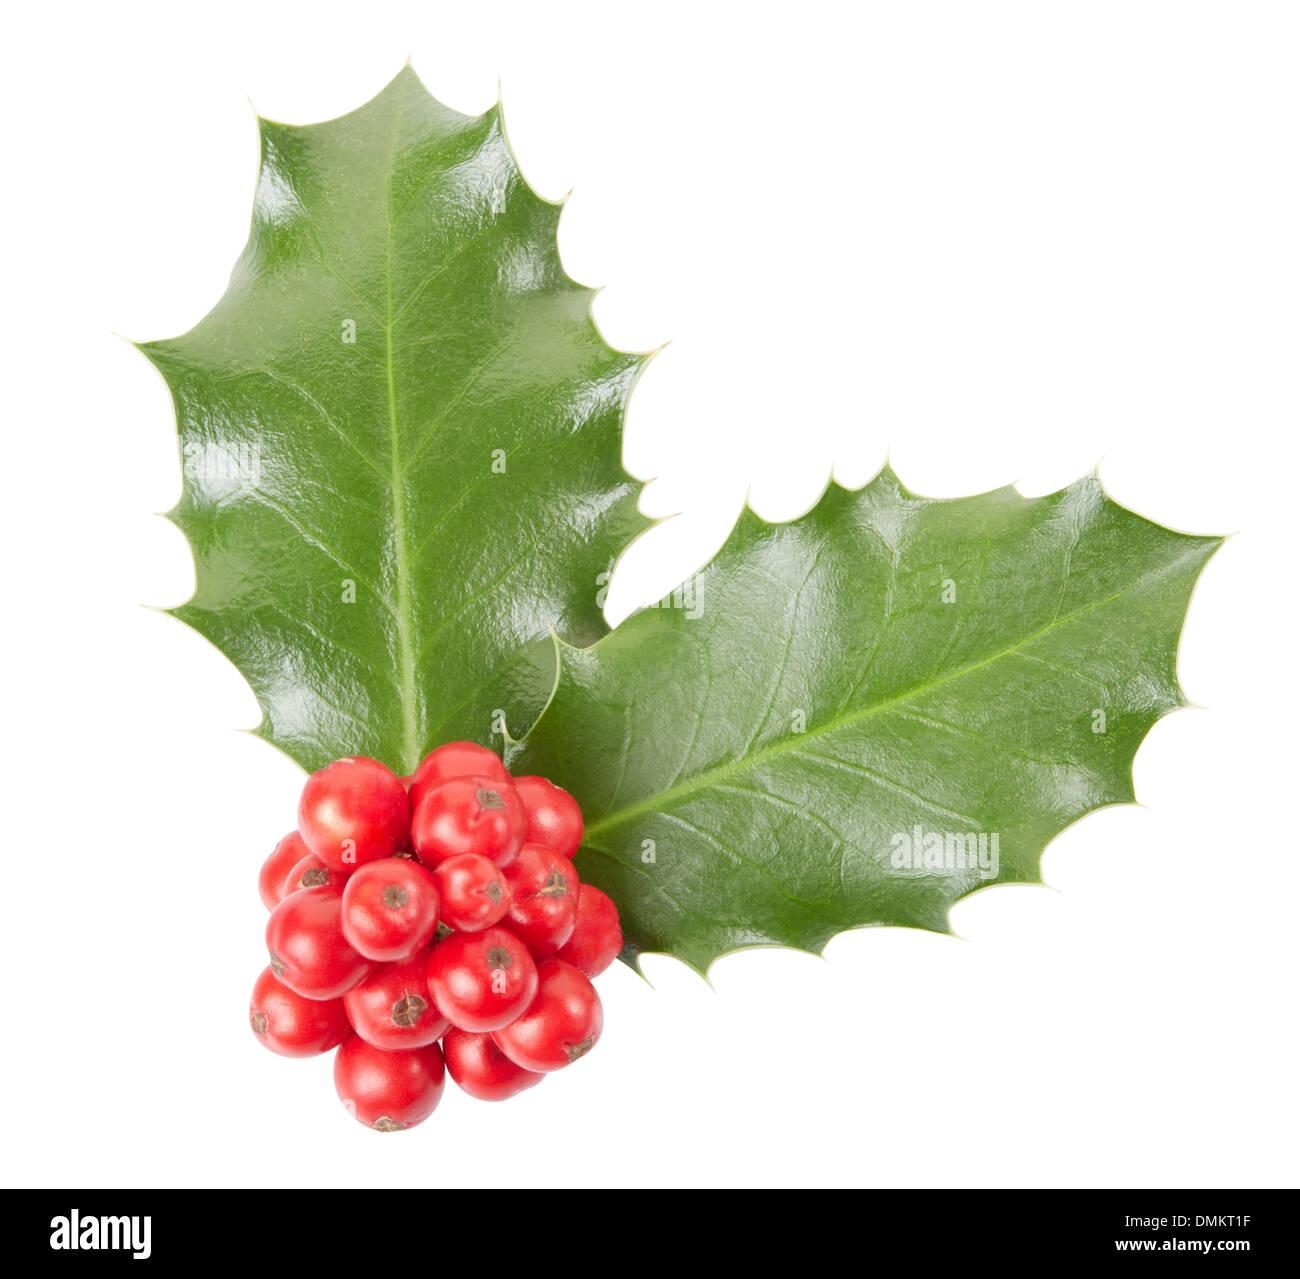 Holly, Christmas decoration - Stock Image